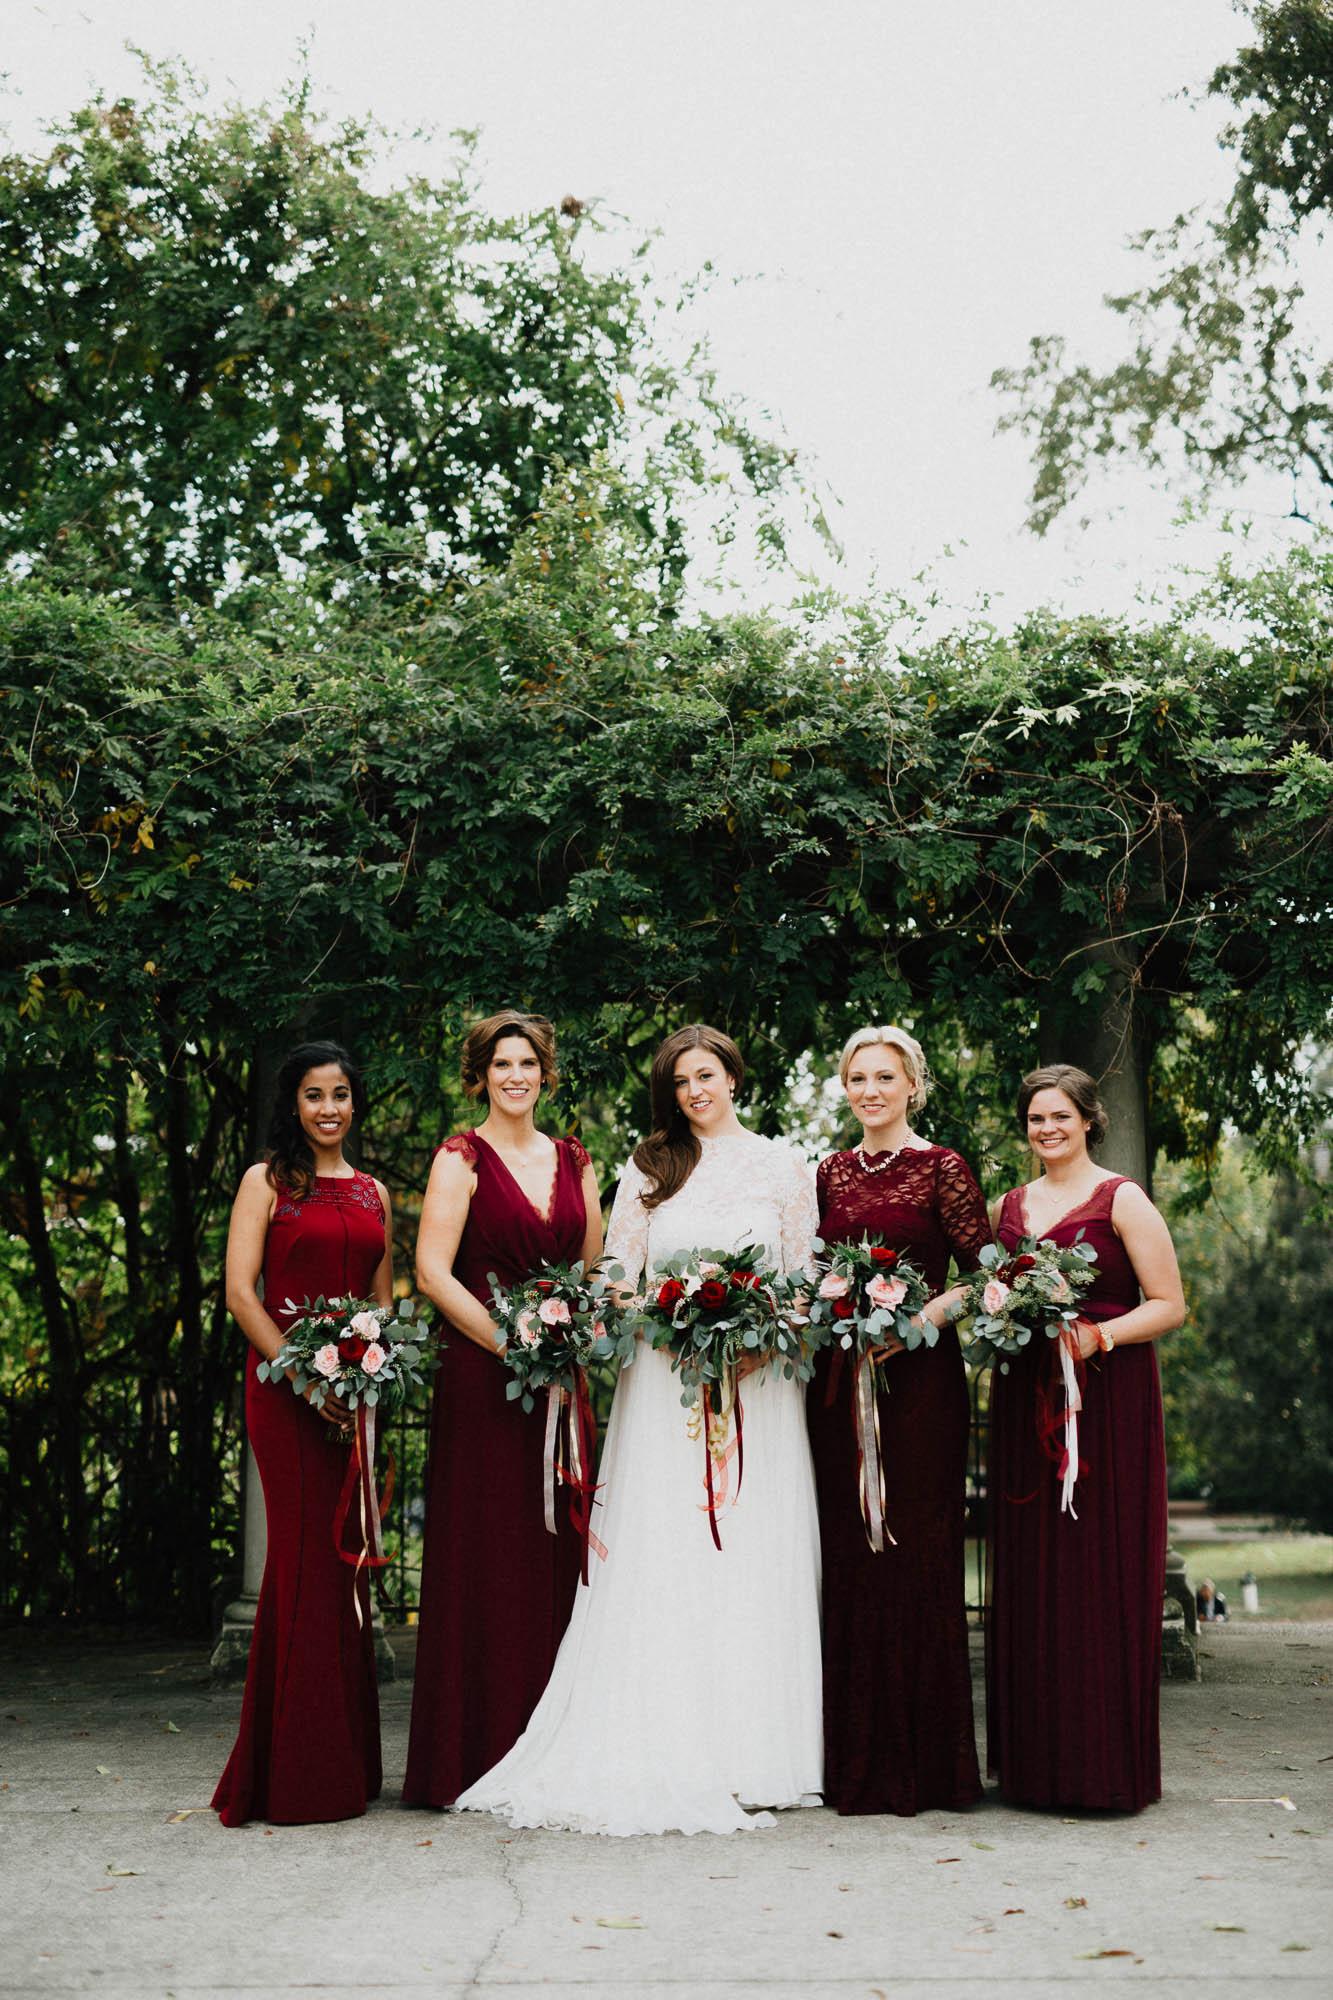 Highline-Car-House-Wedding-Columbus-Kristin-Aaron-038.jpg